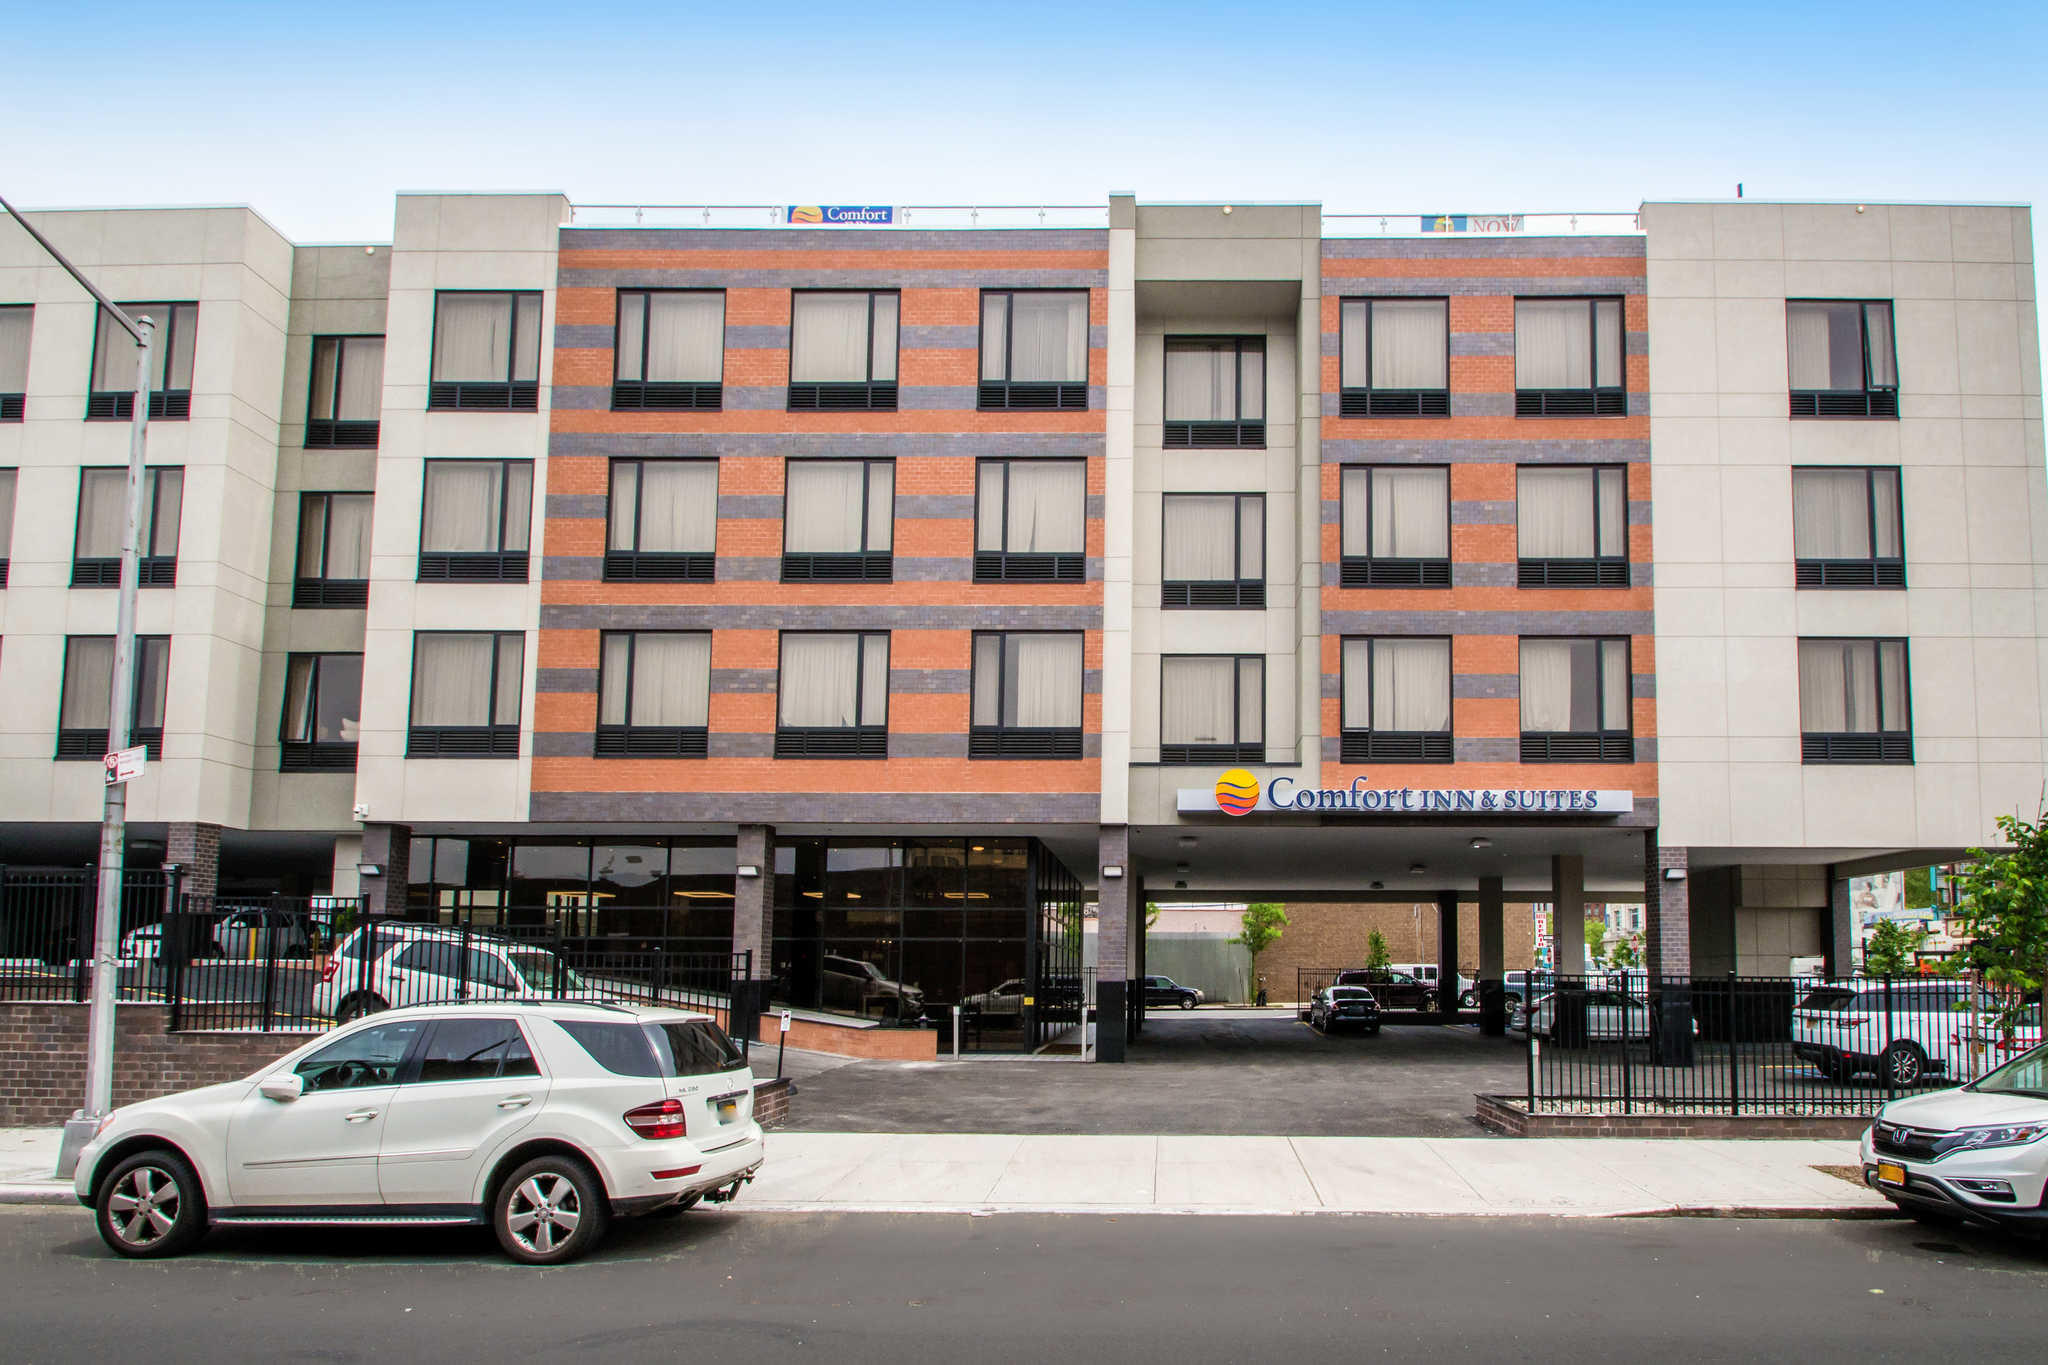 Comfort Inn  U0026 Suites Near Stadium  Bronx New York  Ny